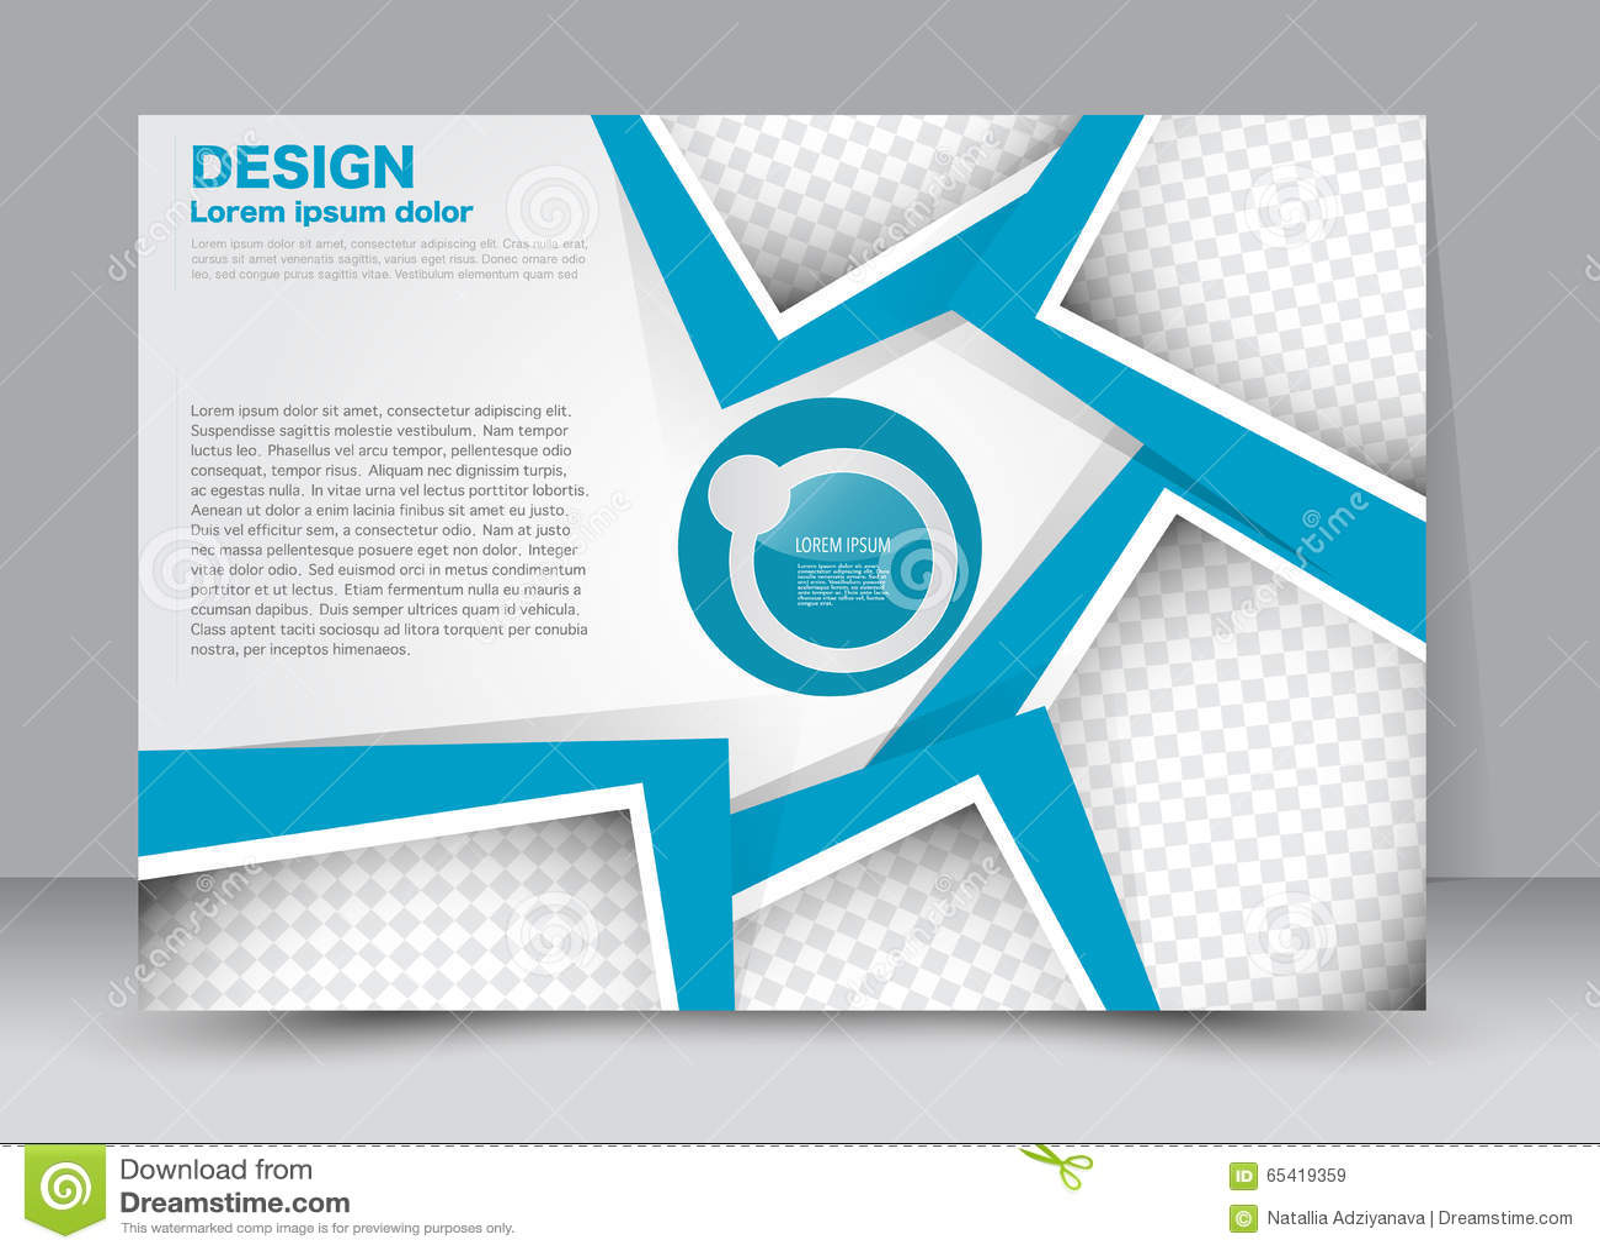 how to develop a magazine for a presentation